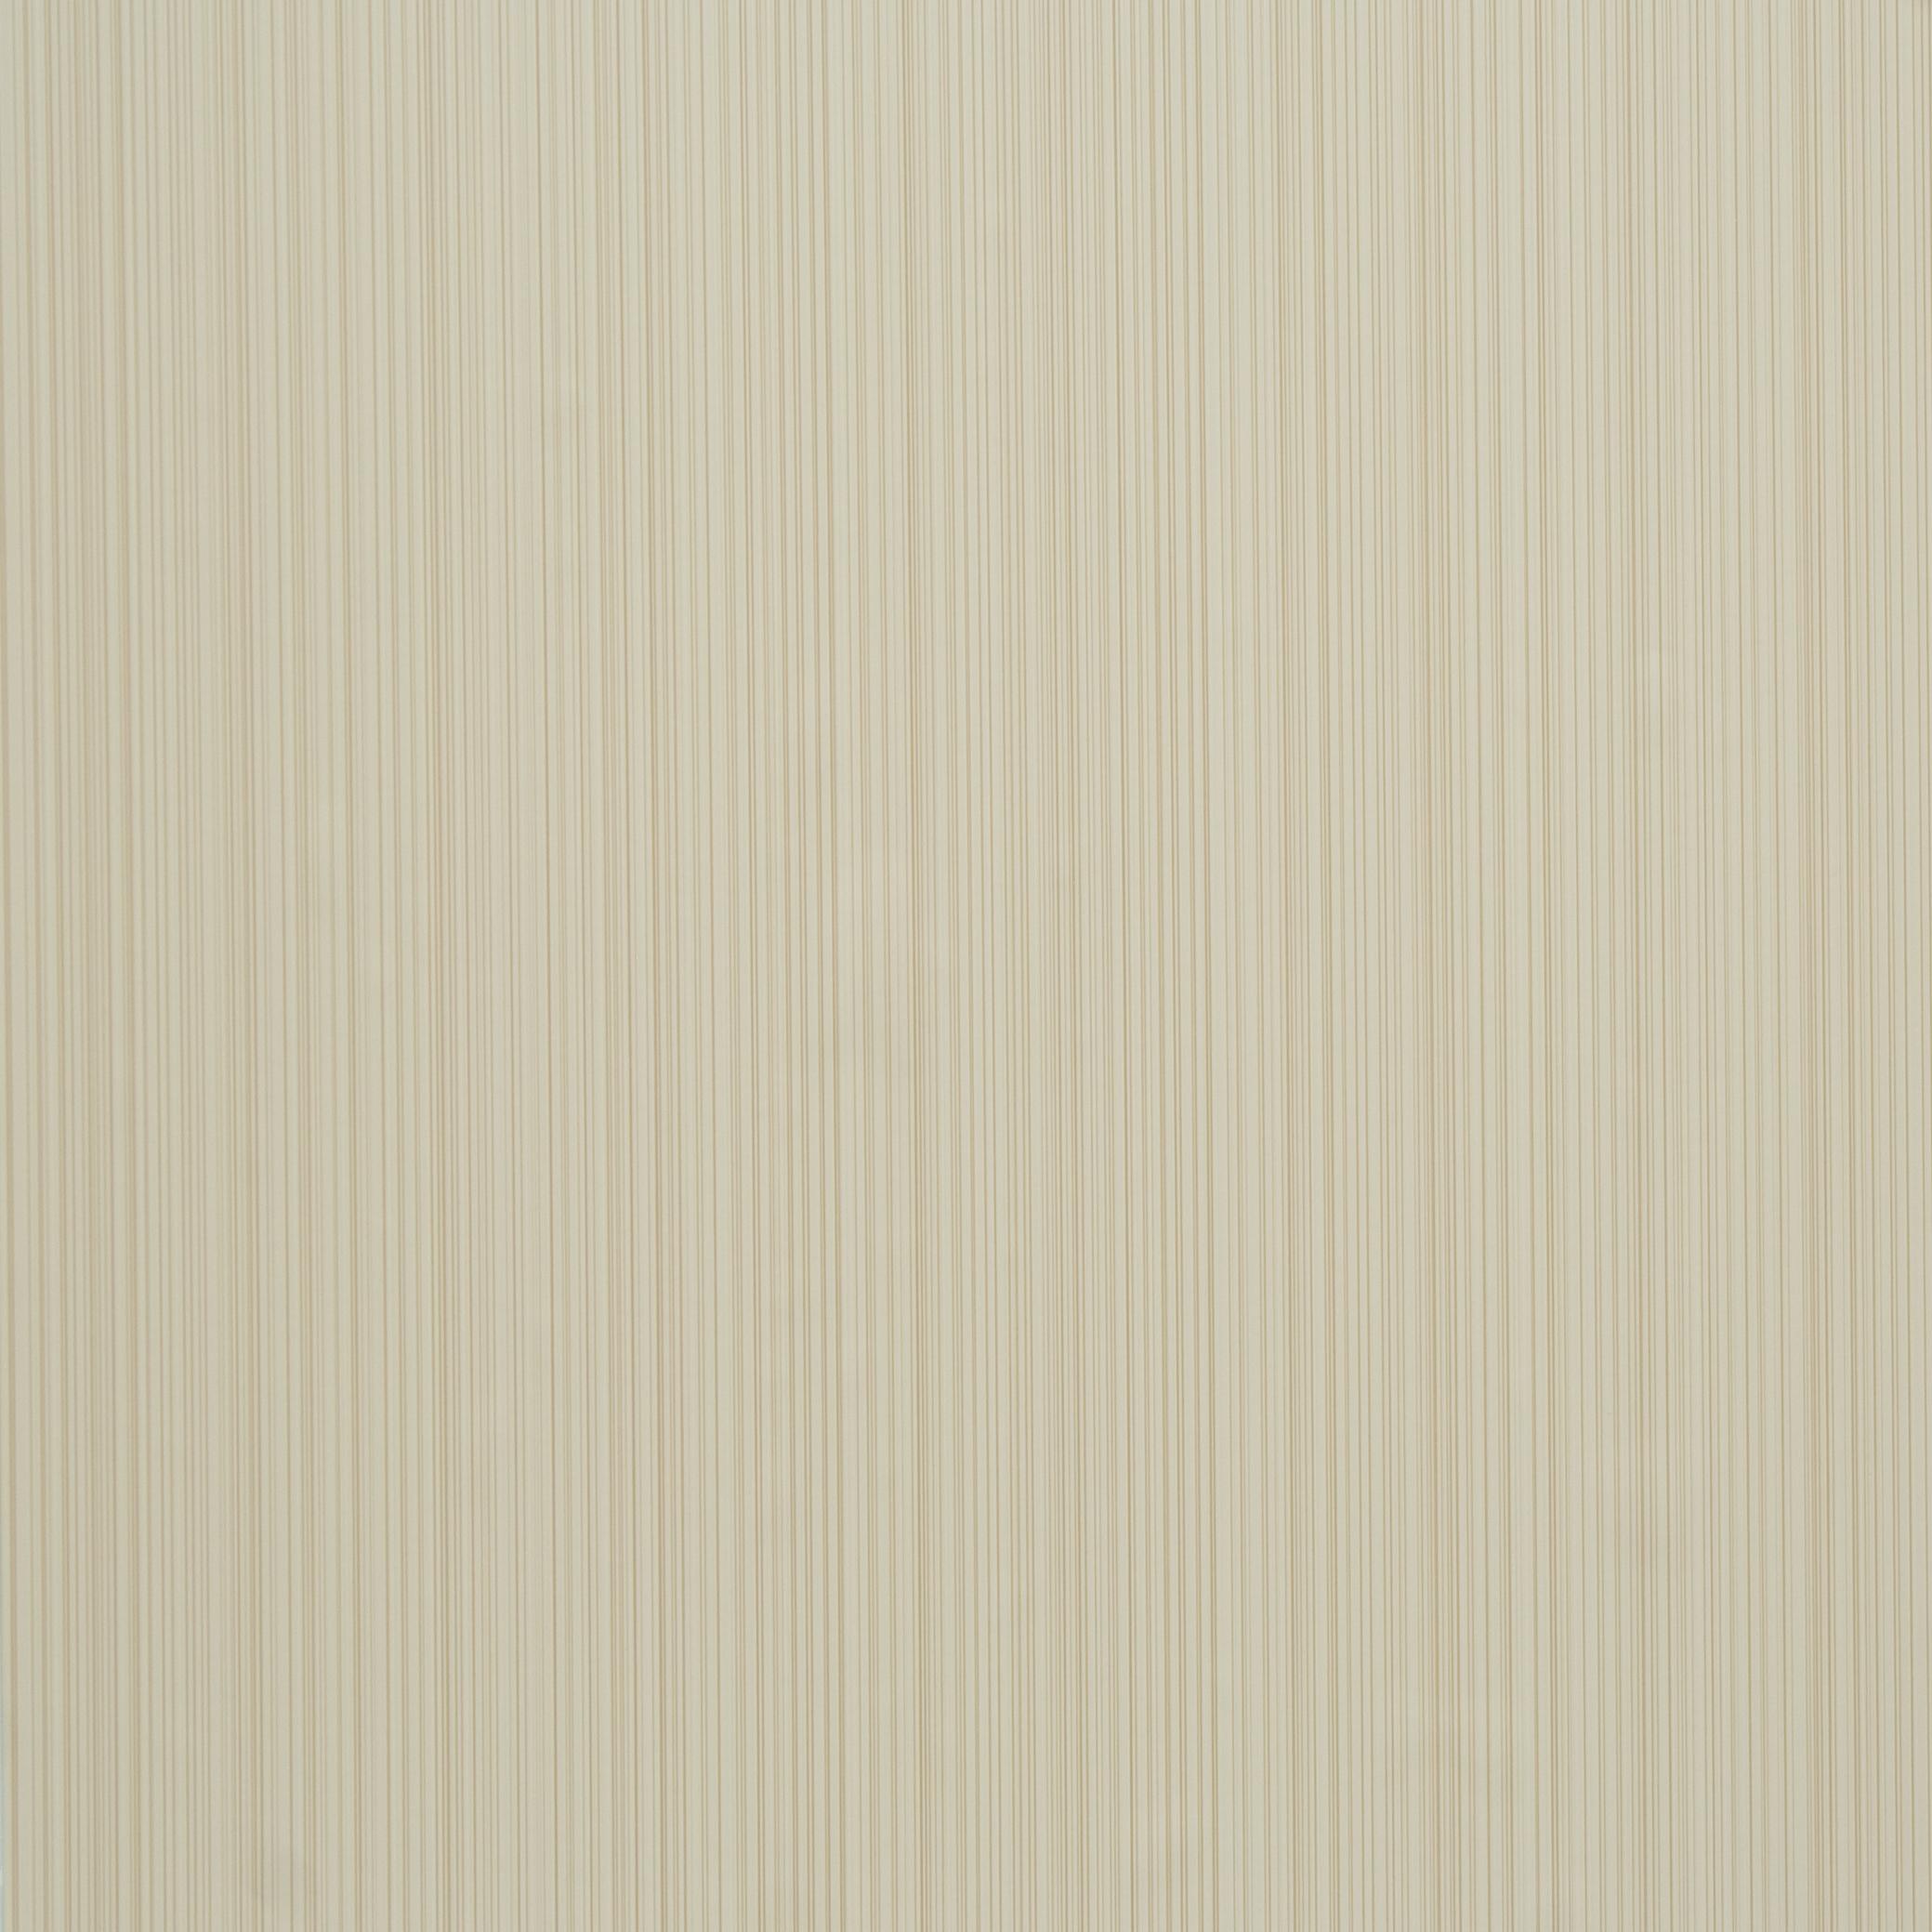 Обои  BN International,  коллекция Colour Line, артикул49115